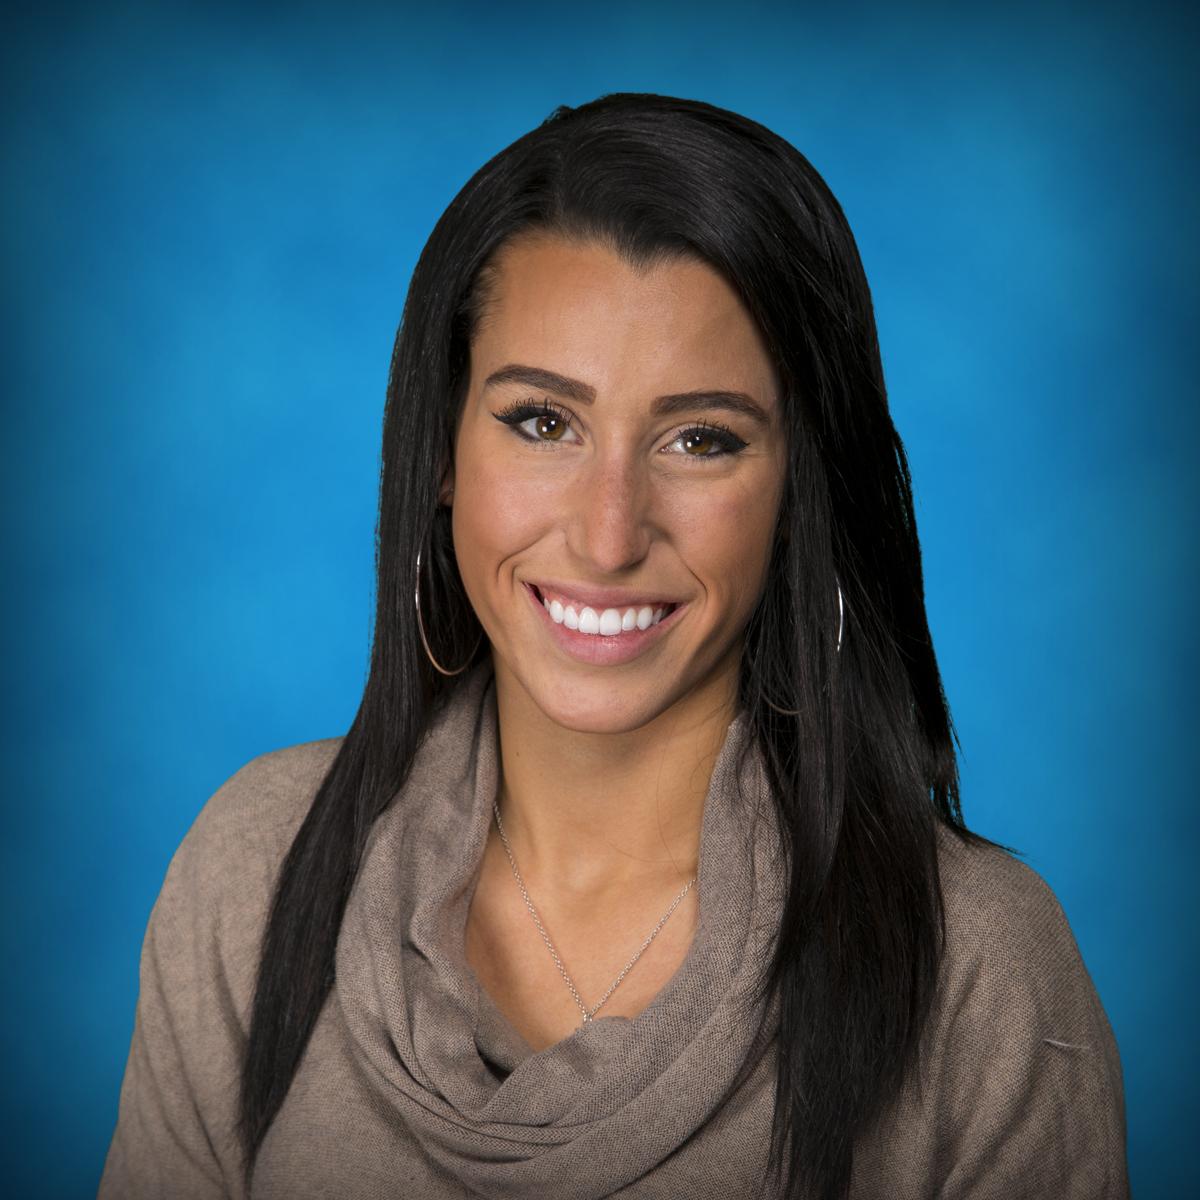 Paige McGregor